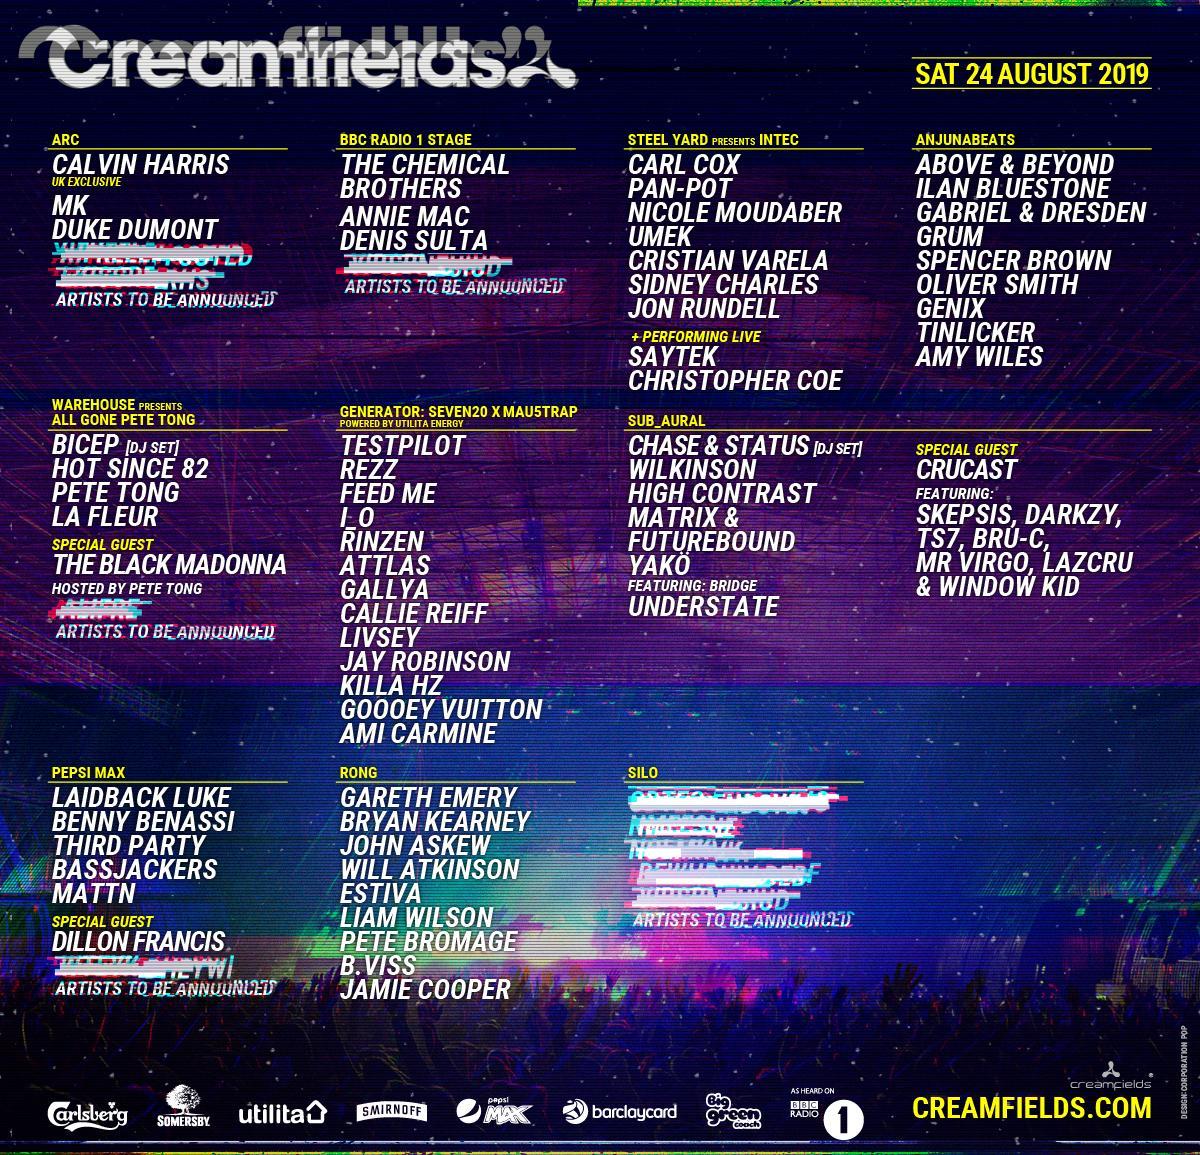 Creamfields 2019 Lineup - Saturday